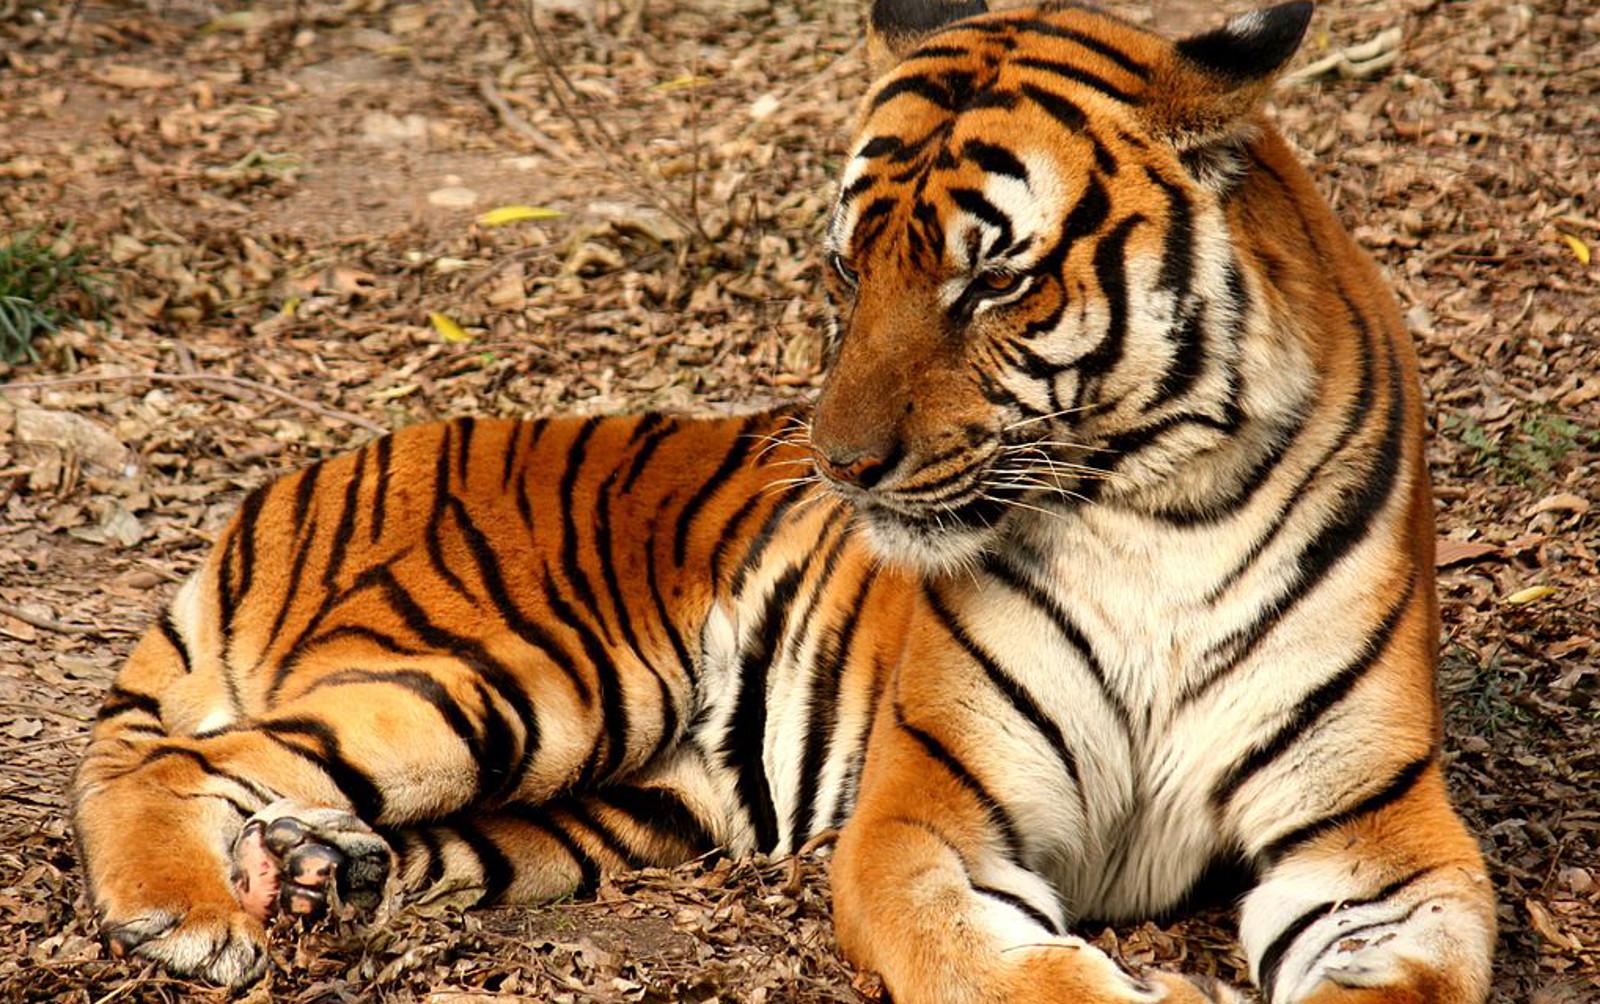 EXPOSED: Thailand's Tiger Kingdom, Sanctuary or Sham